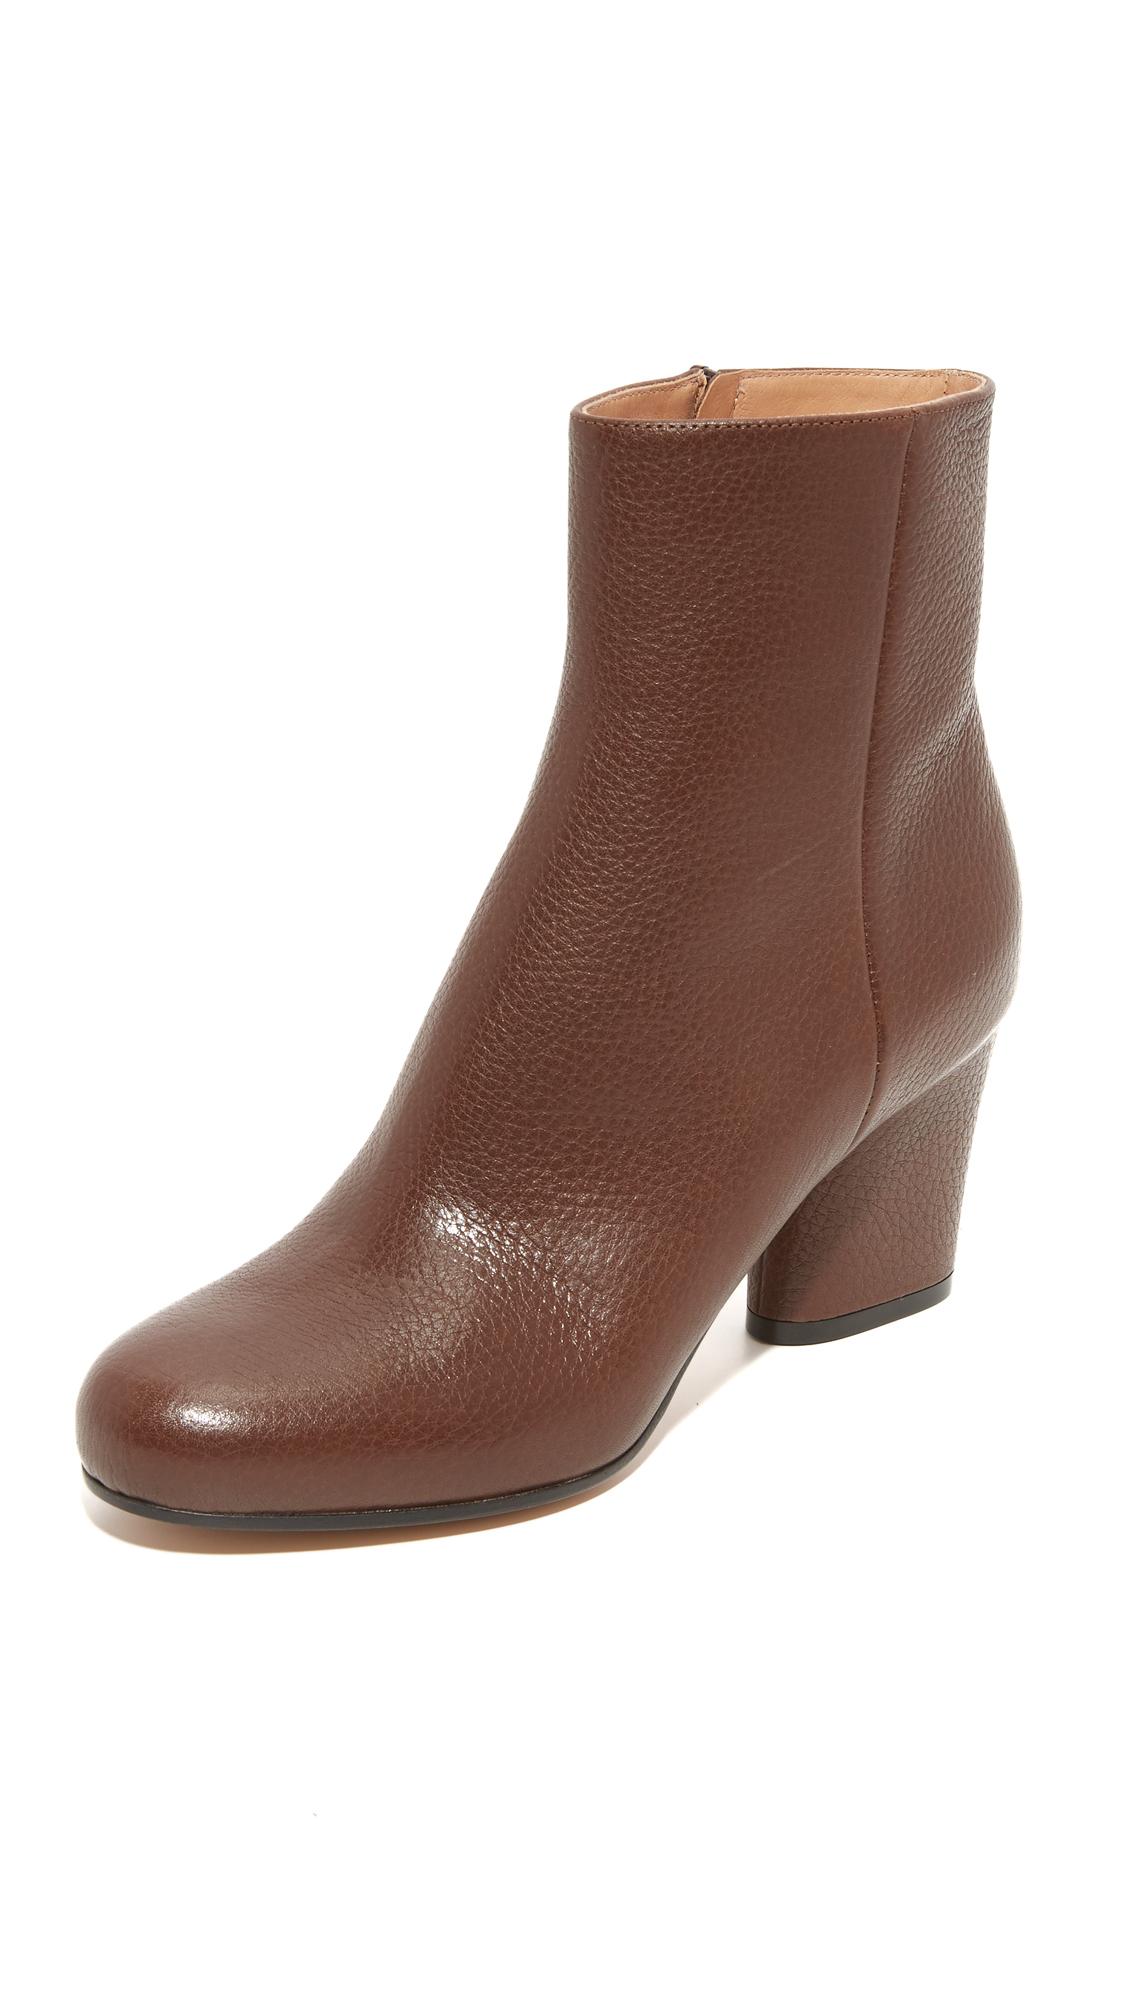 Maison Margiela Leather Booties - Dark Brown